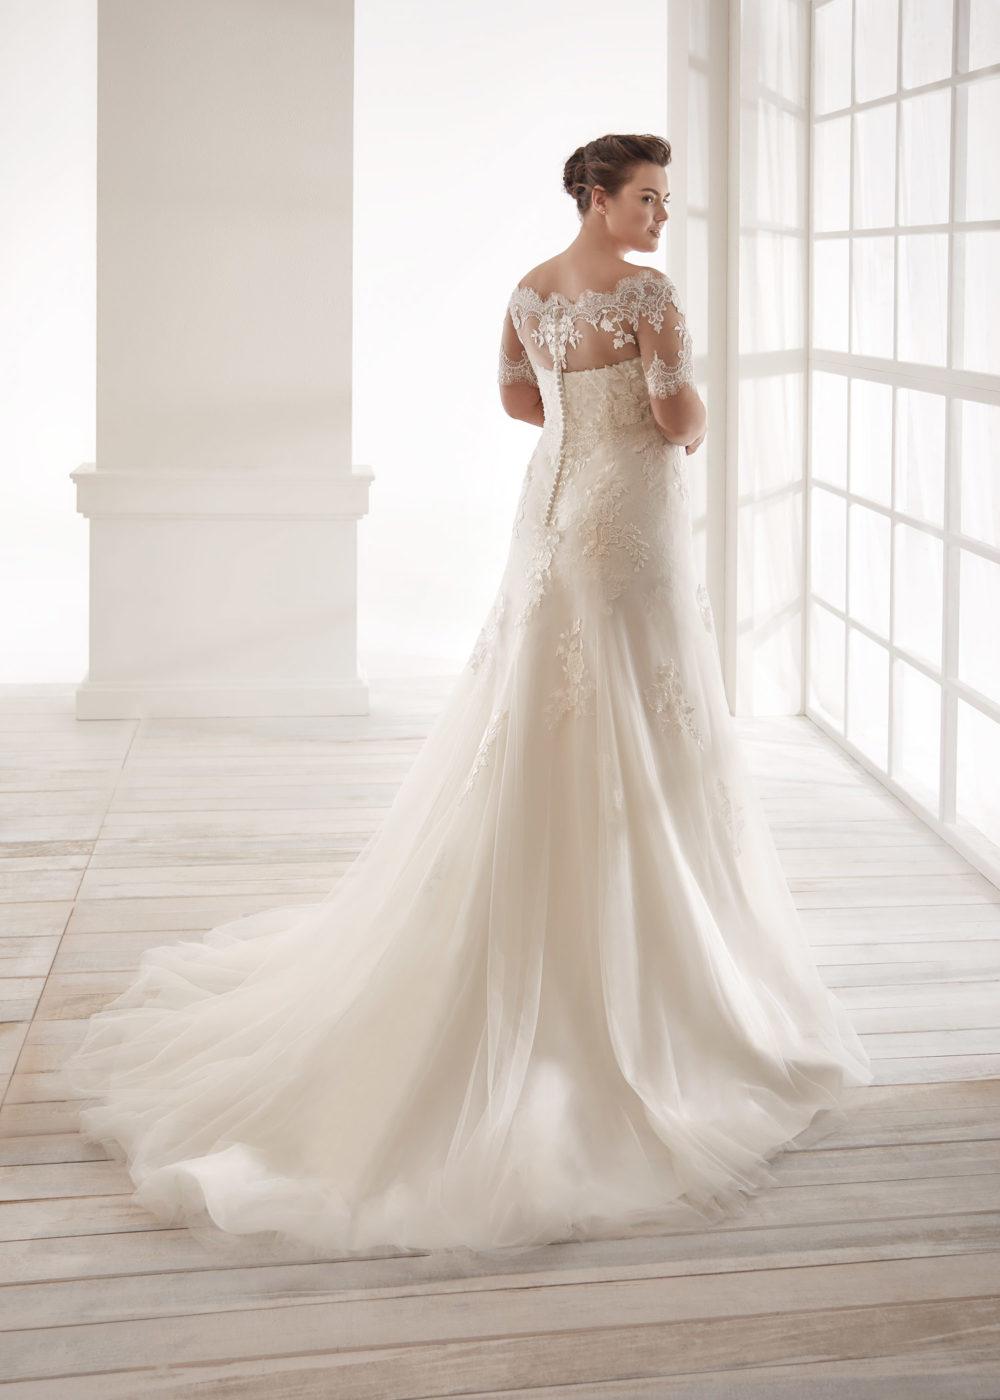 Mariages: abito da sposa Curvy 2020 a Vicenza, Verona, Padova, Veneto CVA20092